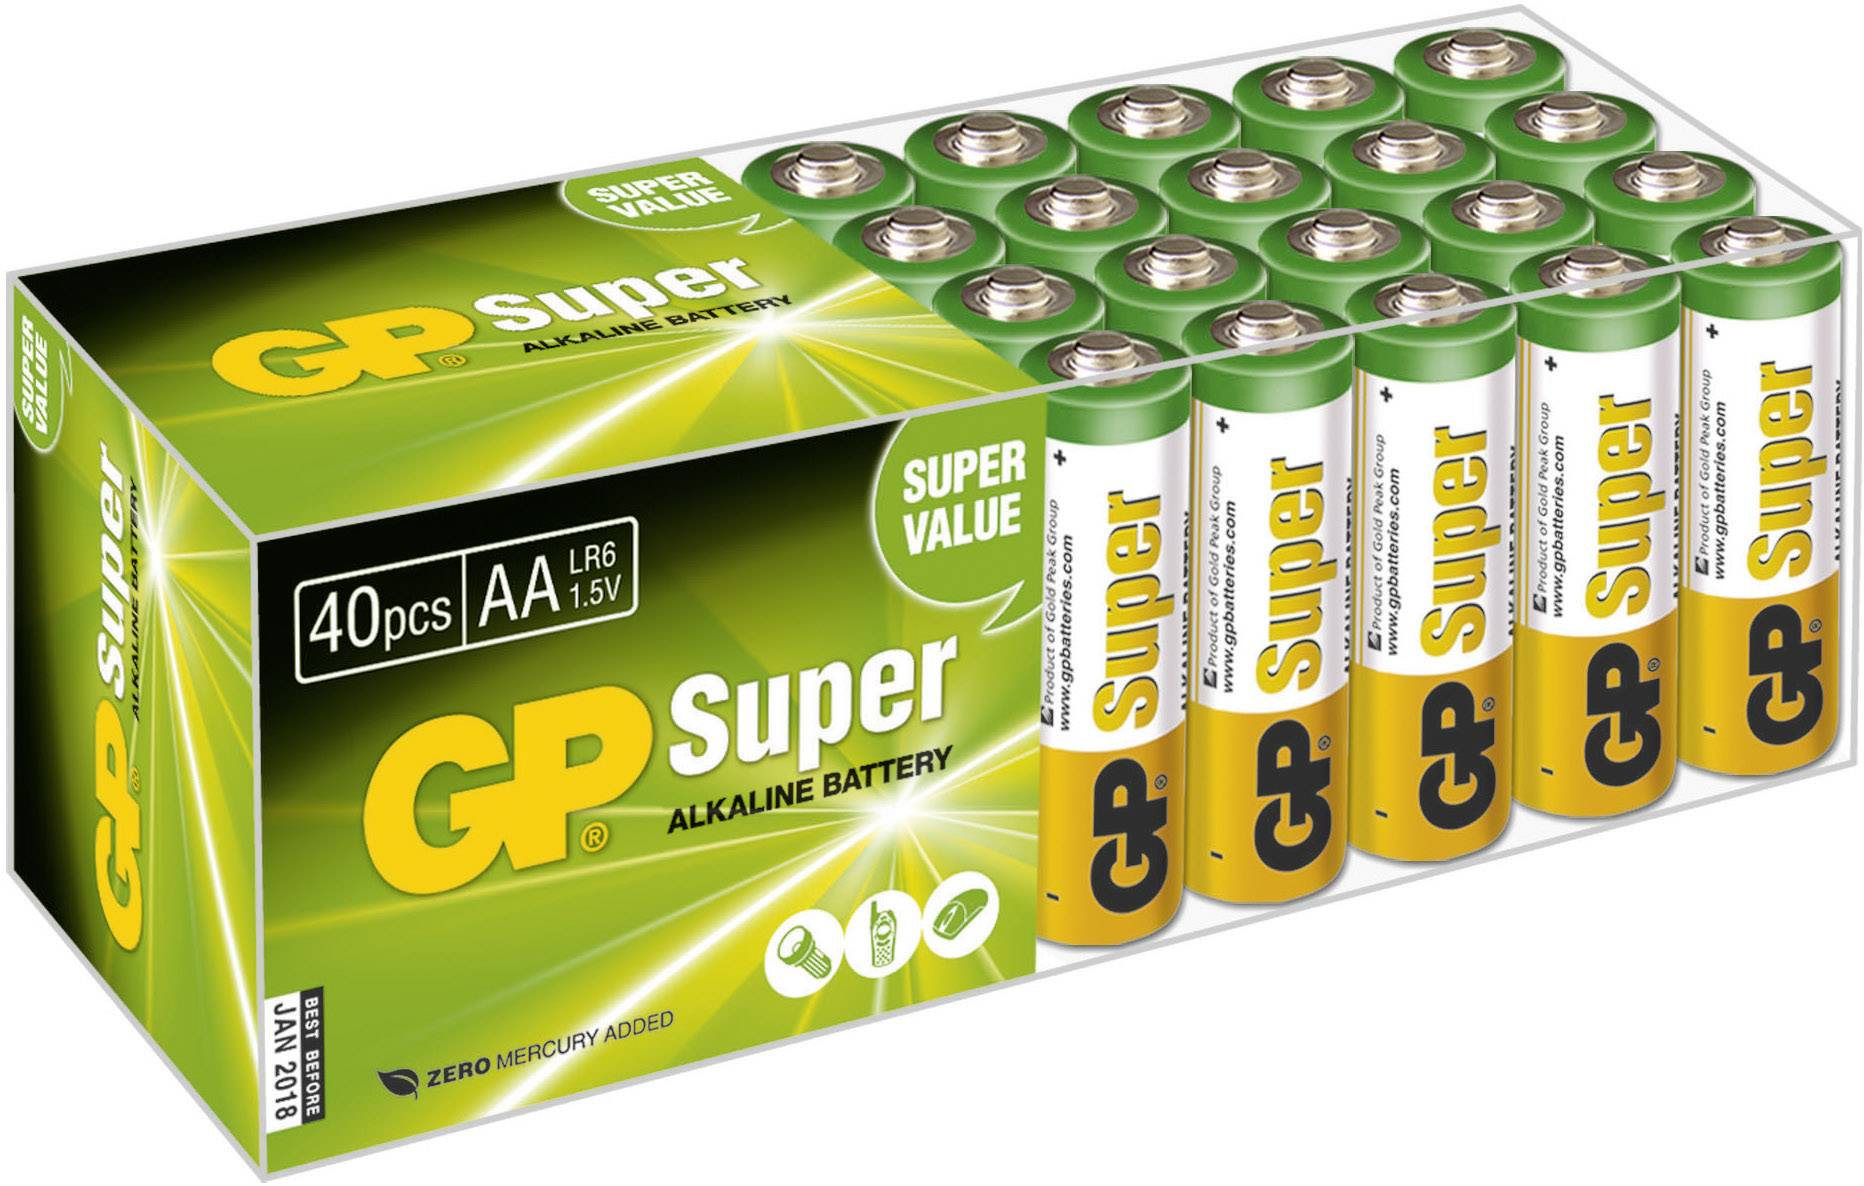 Tužková batéria typu AA alkalicko/mangánová GP Batteries Super Alkaline, 1.5 V, 40 ks